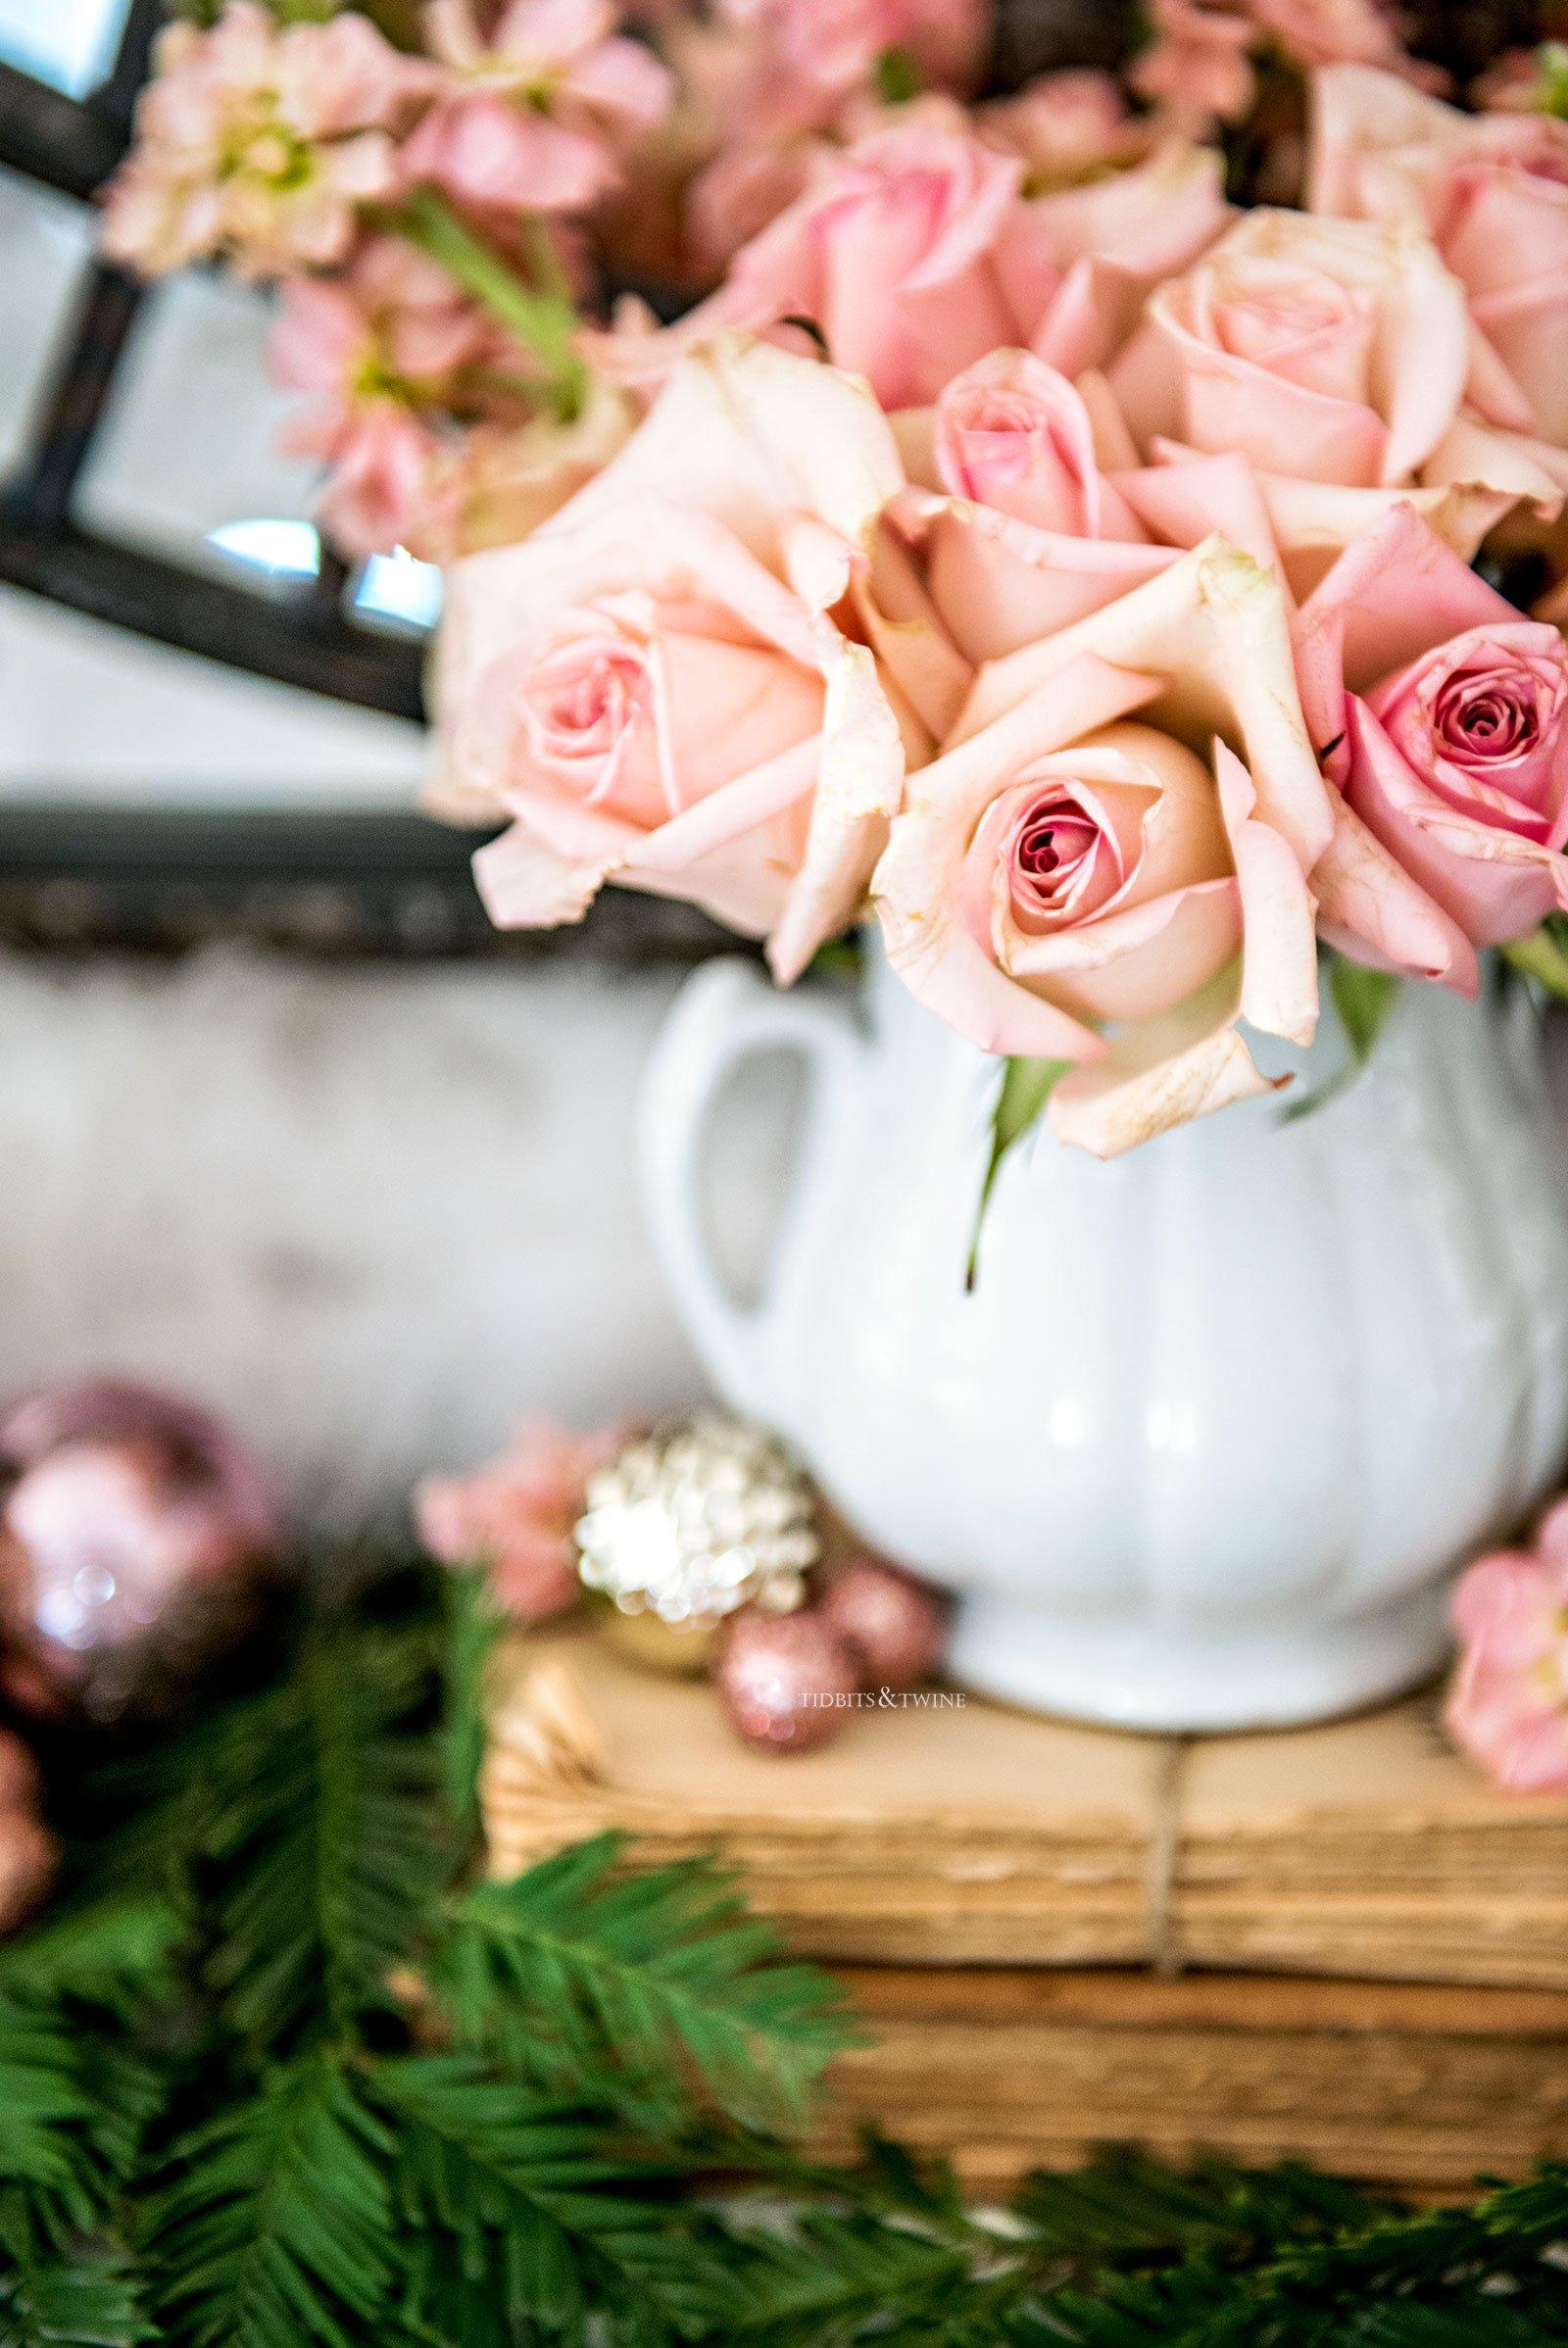 Pink roses and ironstone Christmas display